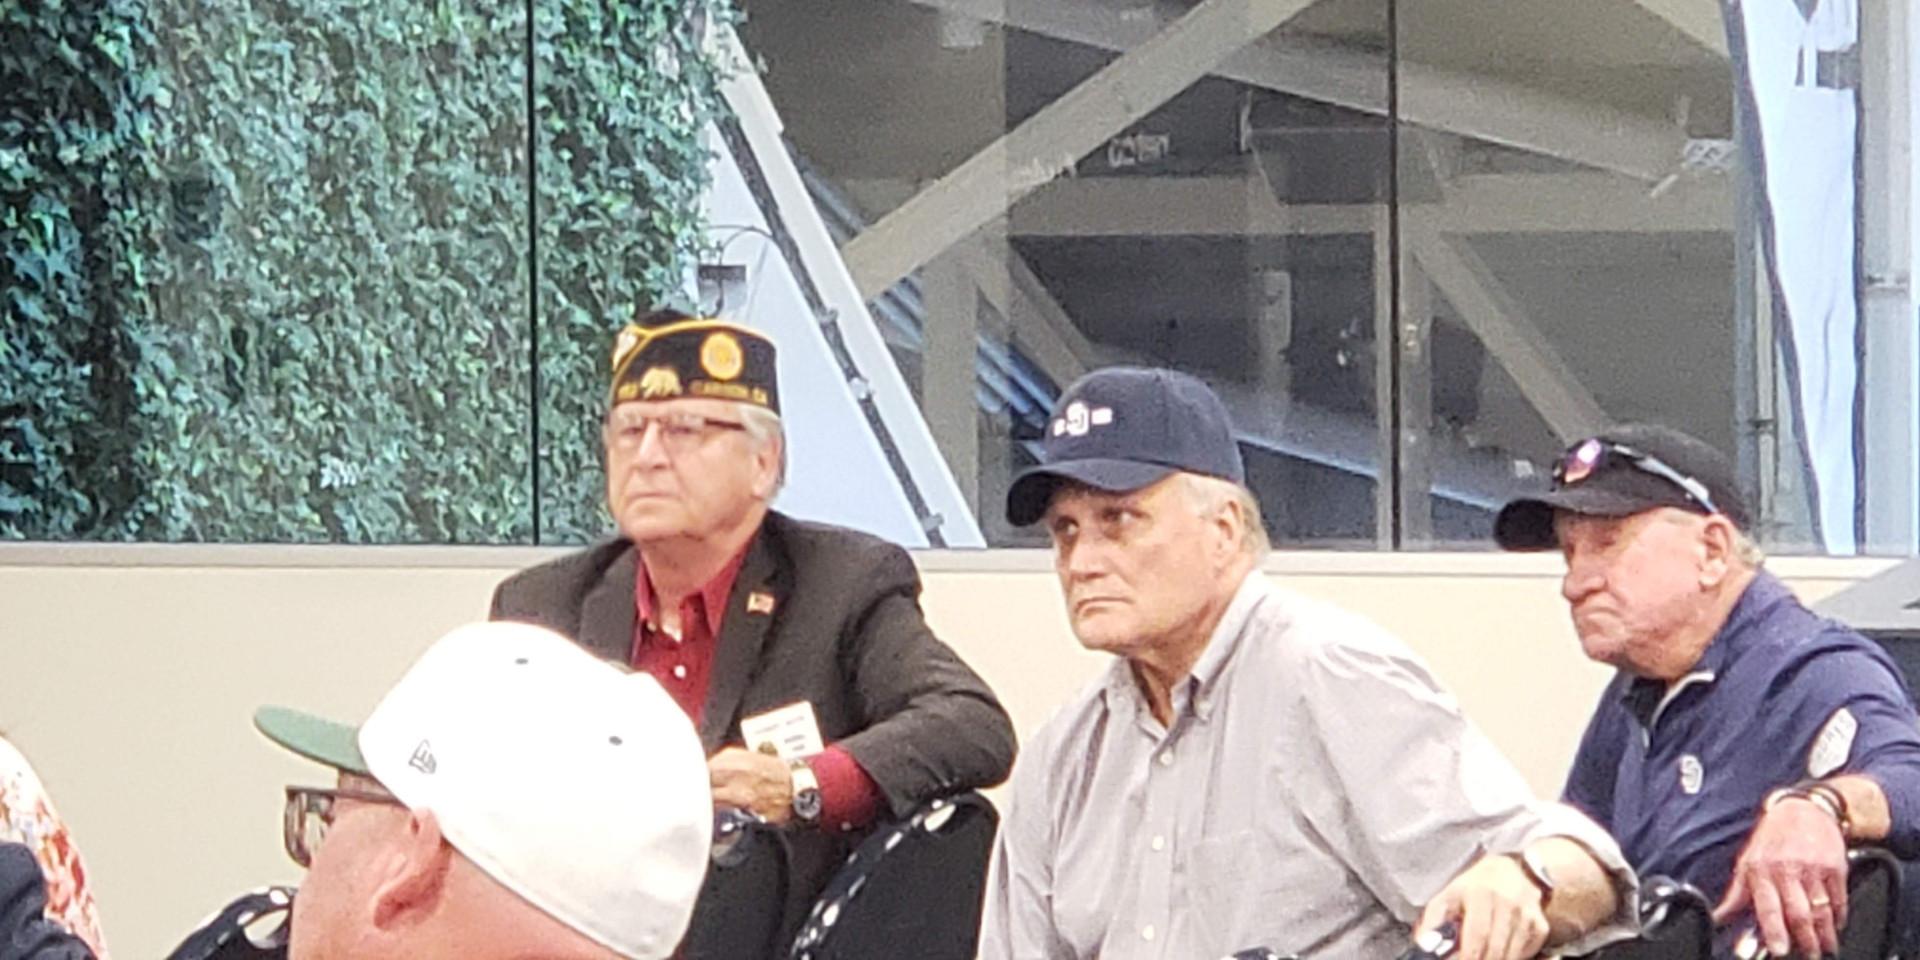 Bob Boyd CA State Legion Baseball Commissioner and JJ Quinn